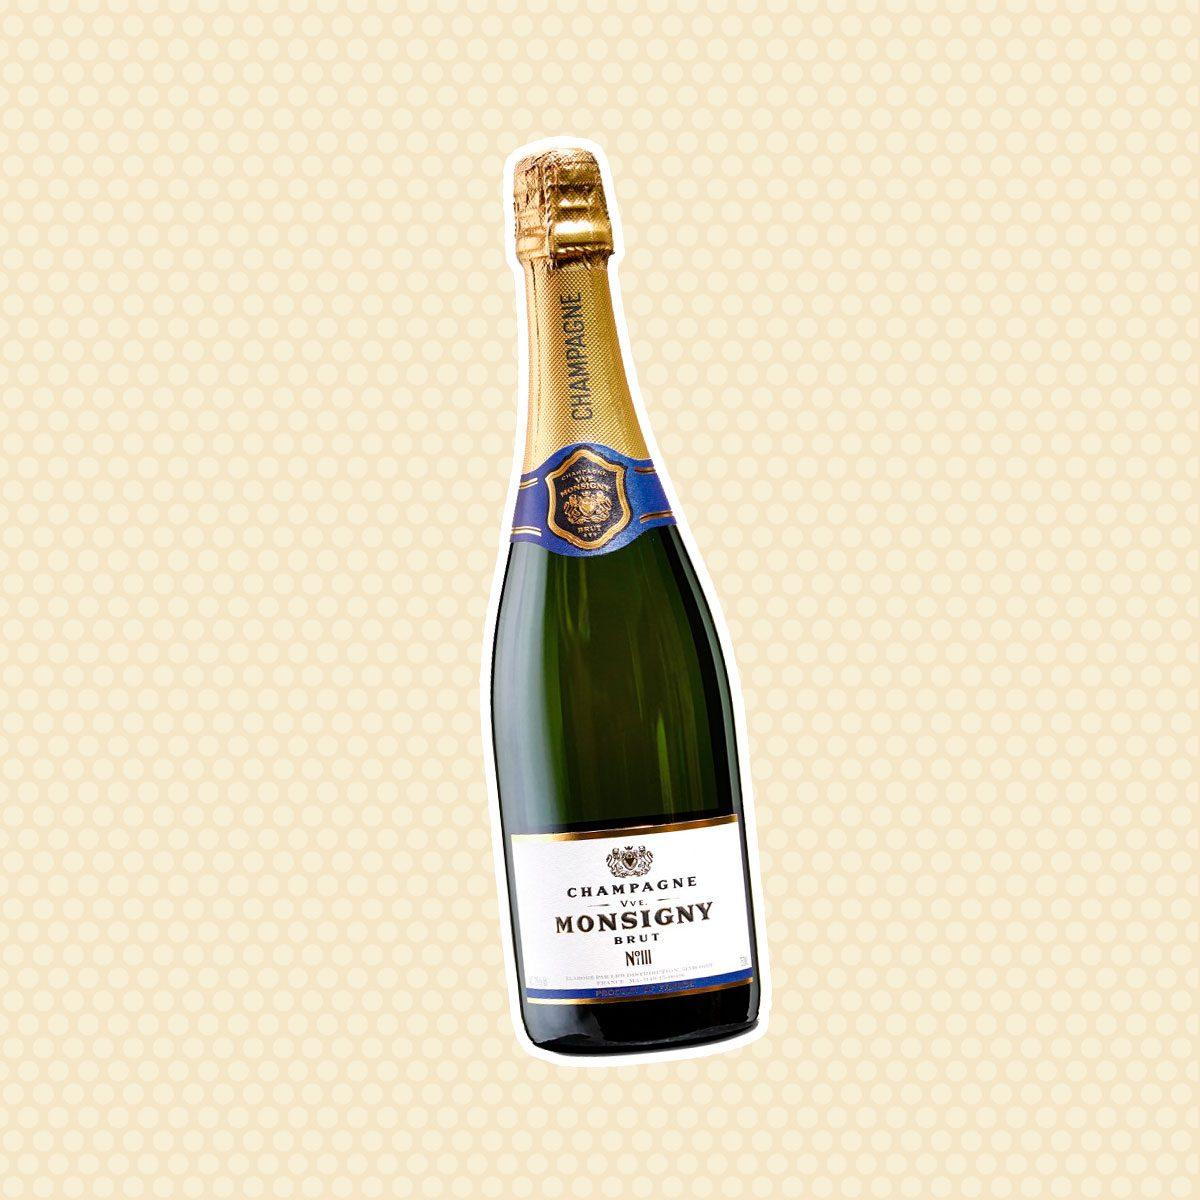 Vve. Monsigny Champagne Brut